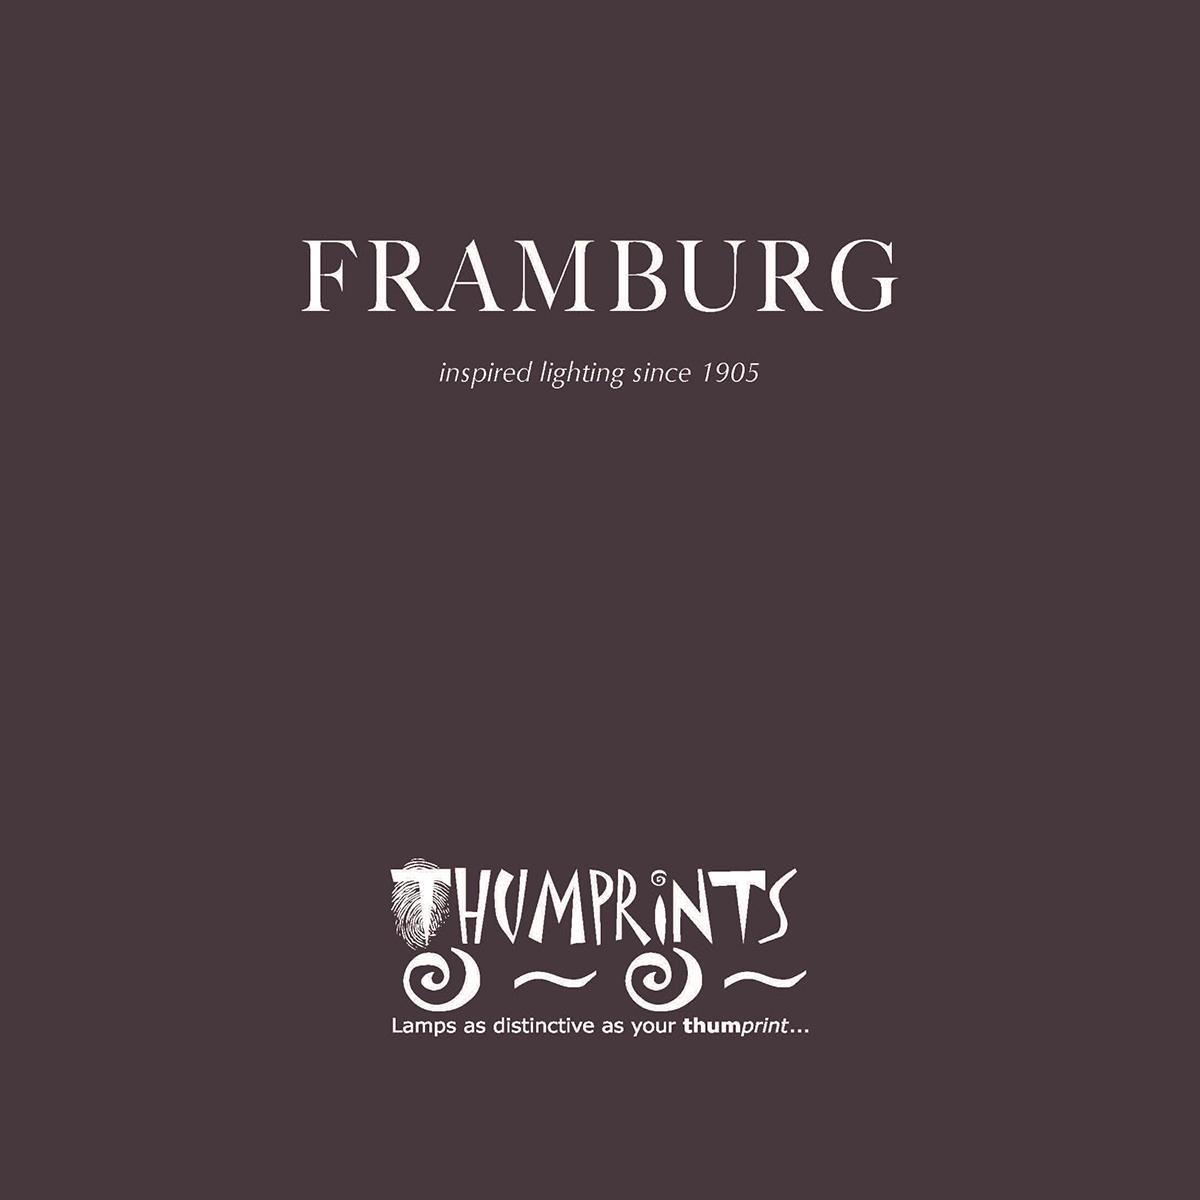 Framburg Household Lighting Wiring Diagram Uk Upcoming Market